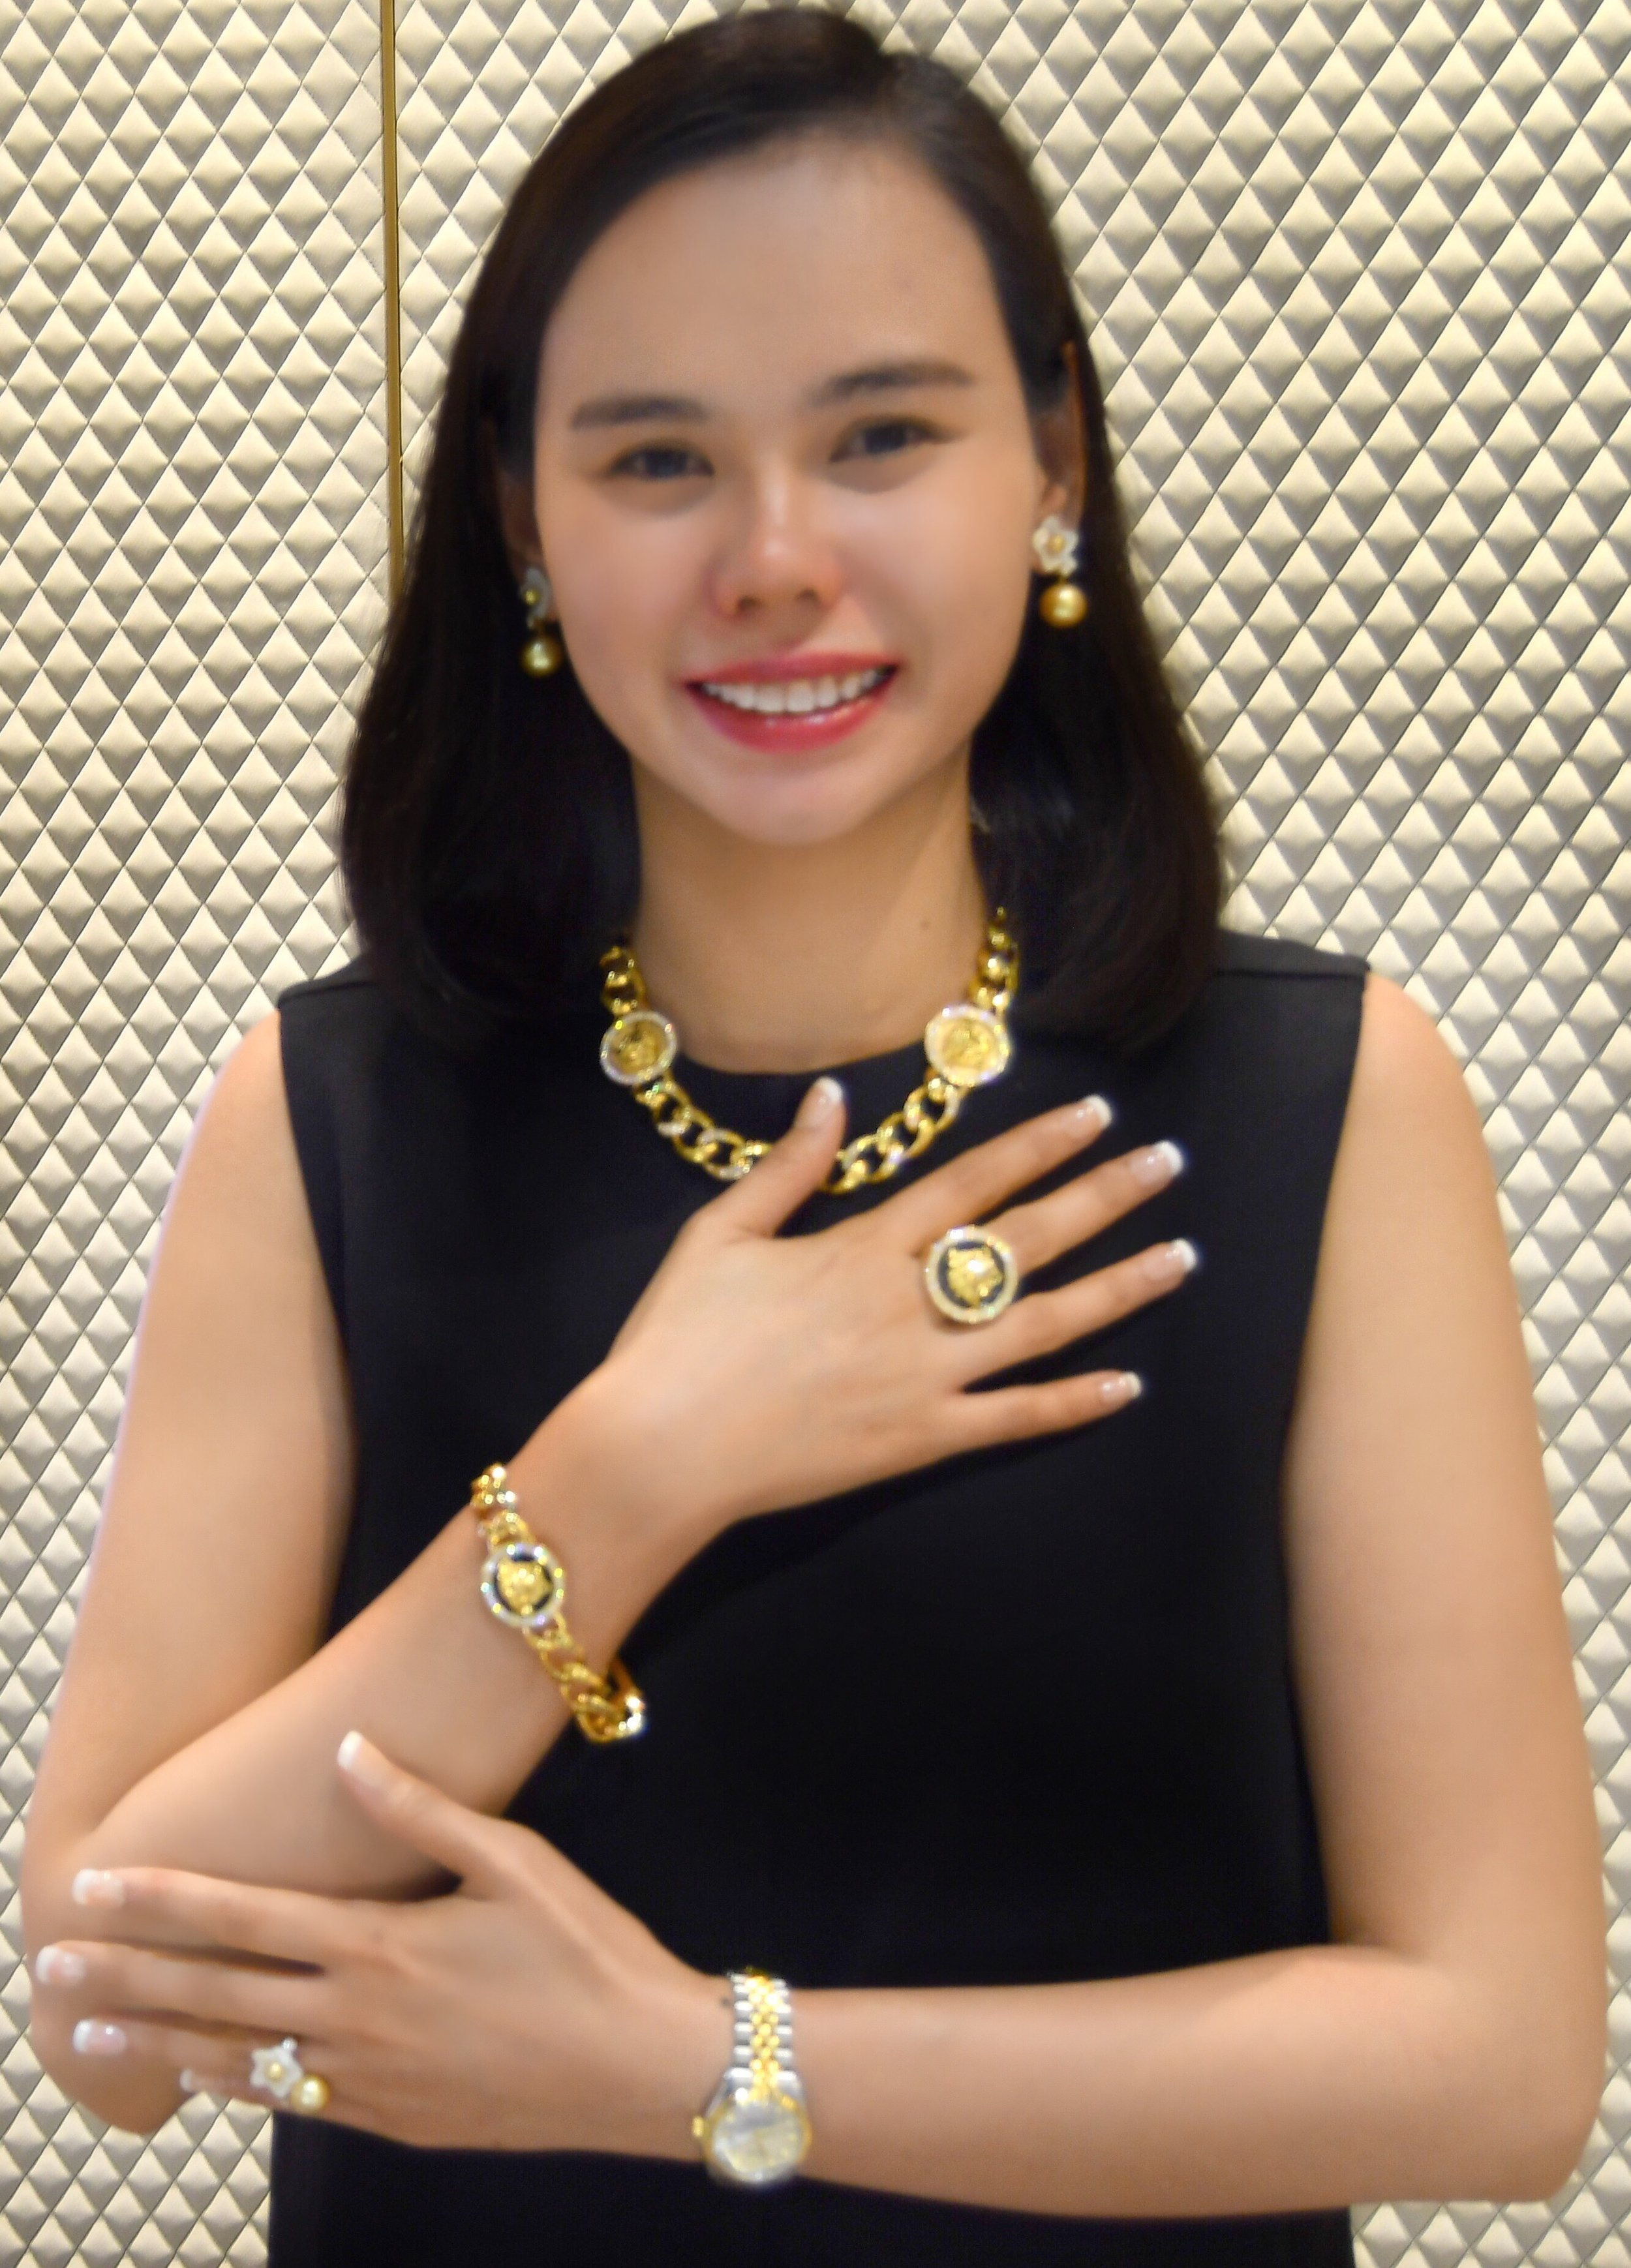 Versace Fine Jewellery - Versace Classic Collection (Palazzo Versace Dubai)